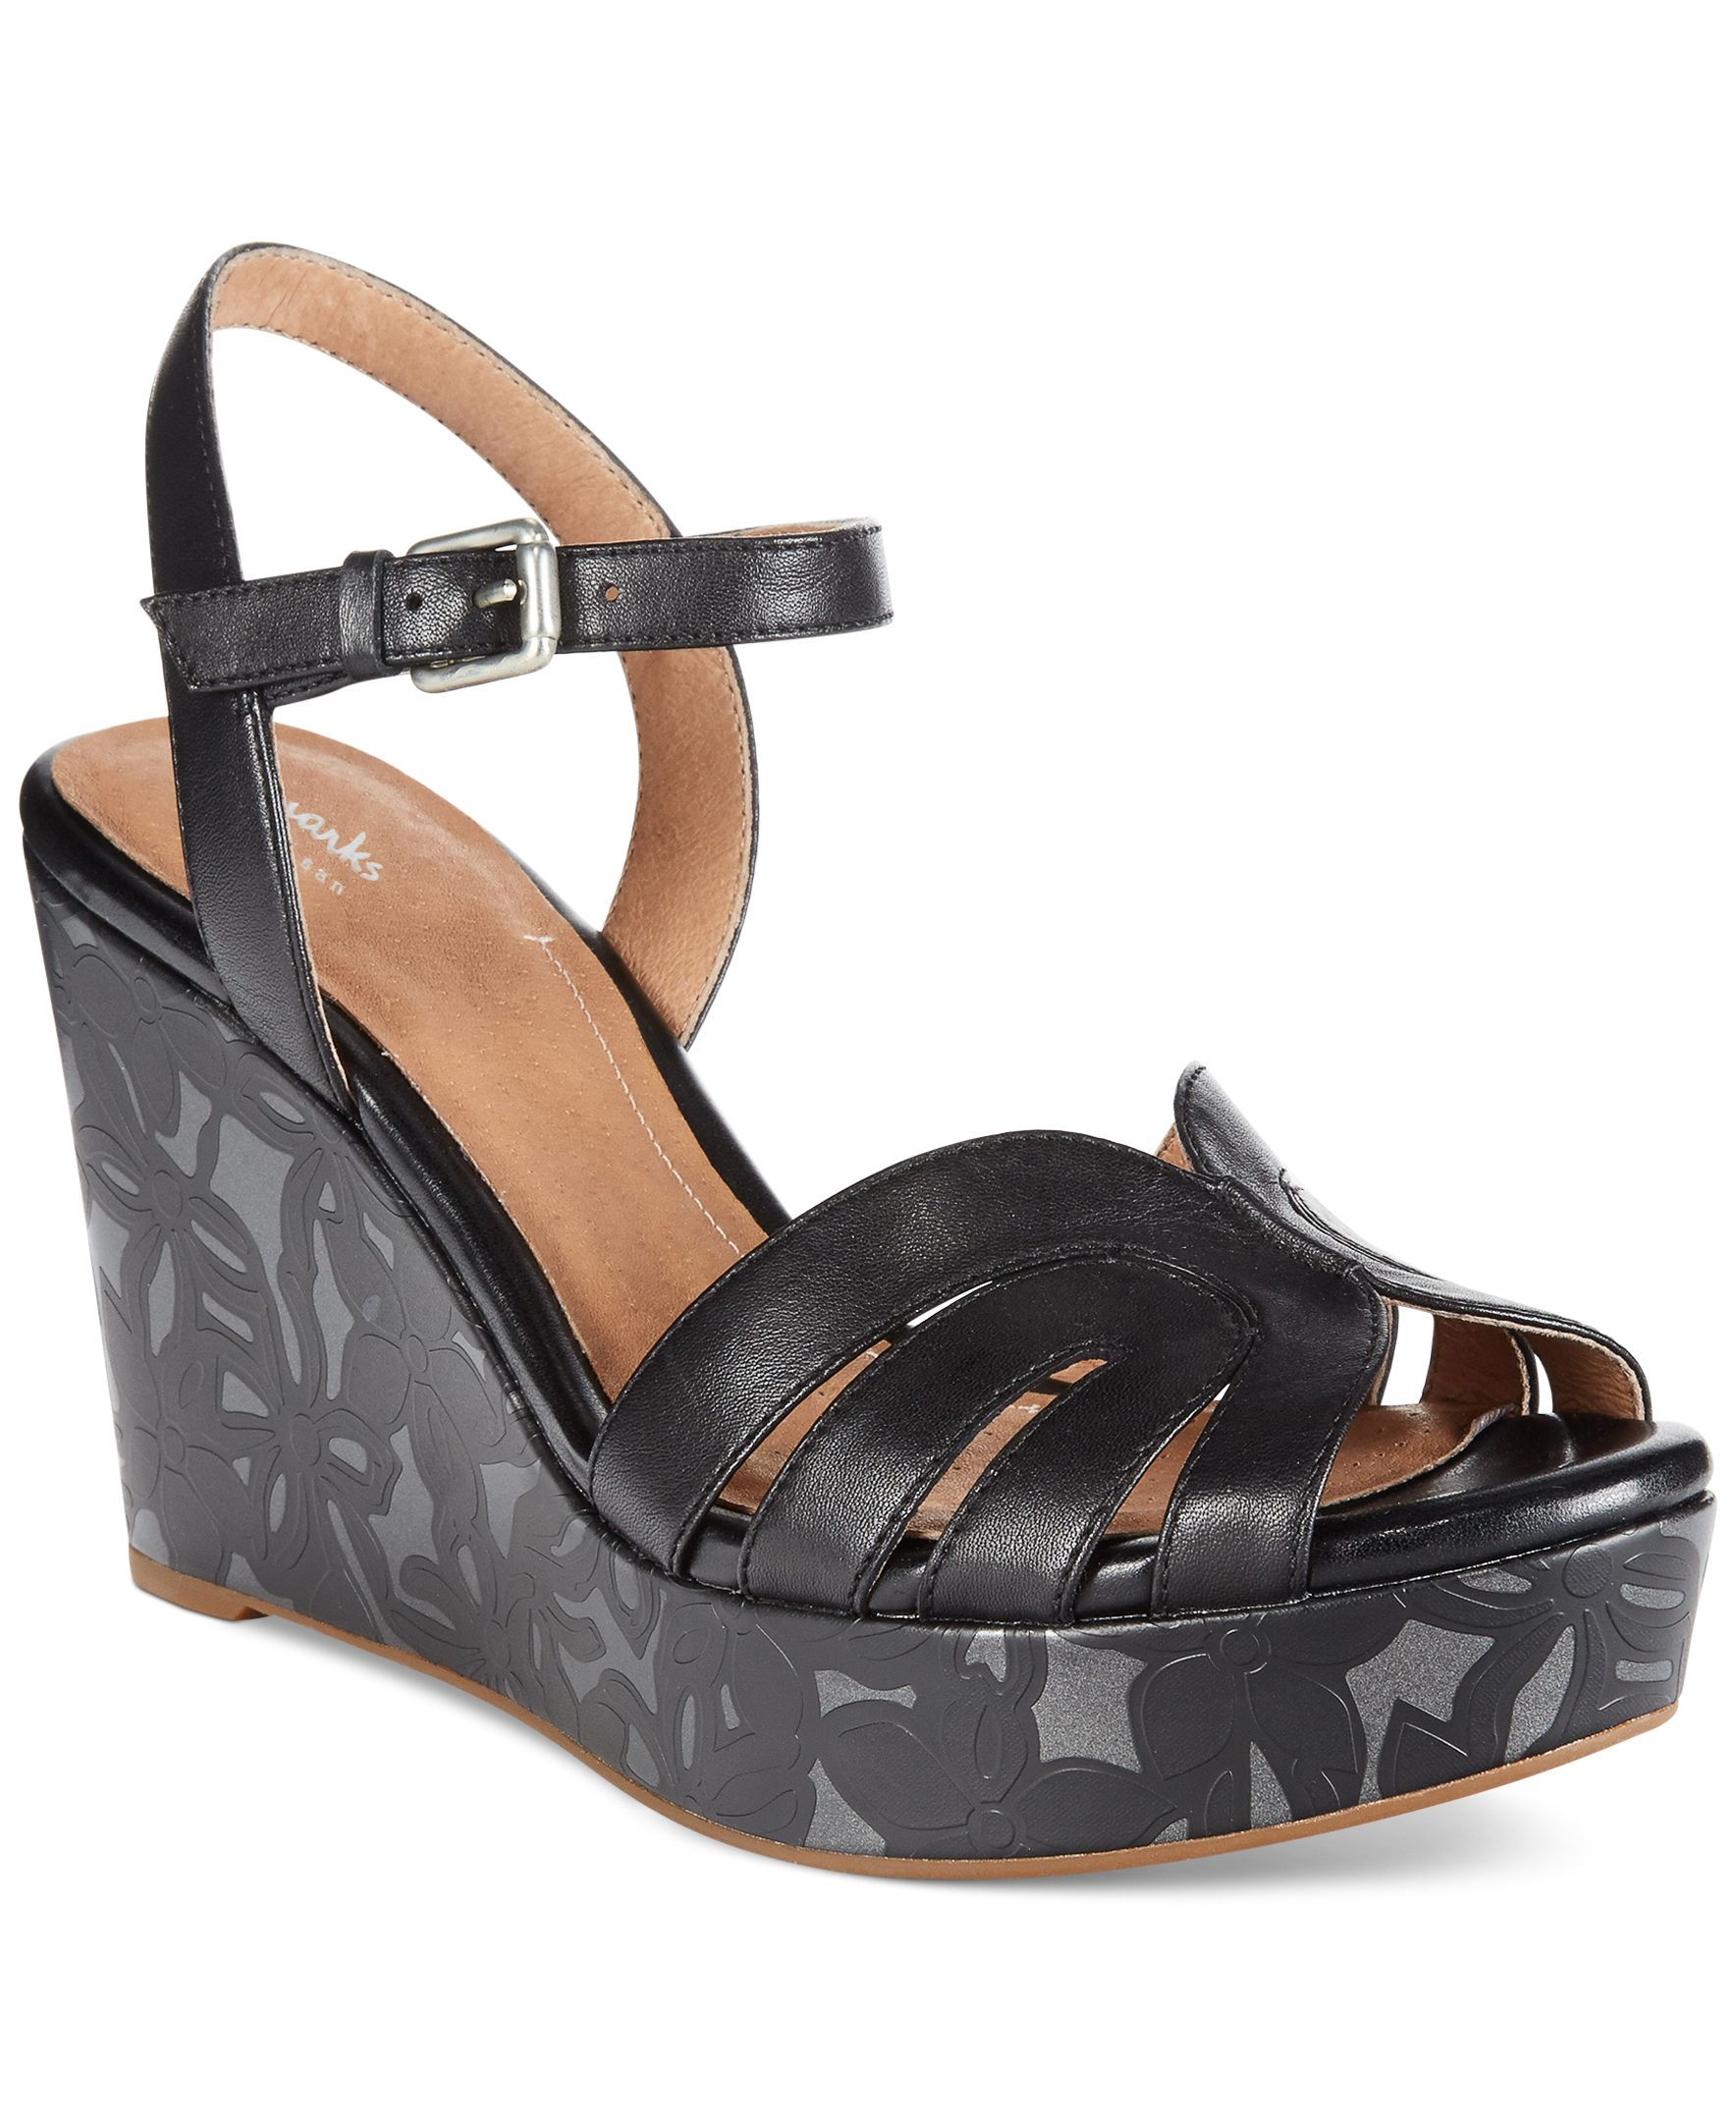 0906c57ff1fb Clarks Artisan Women s Amelia Page Platform Wedge Sandals